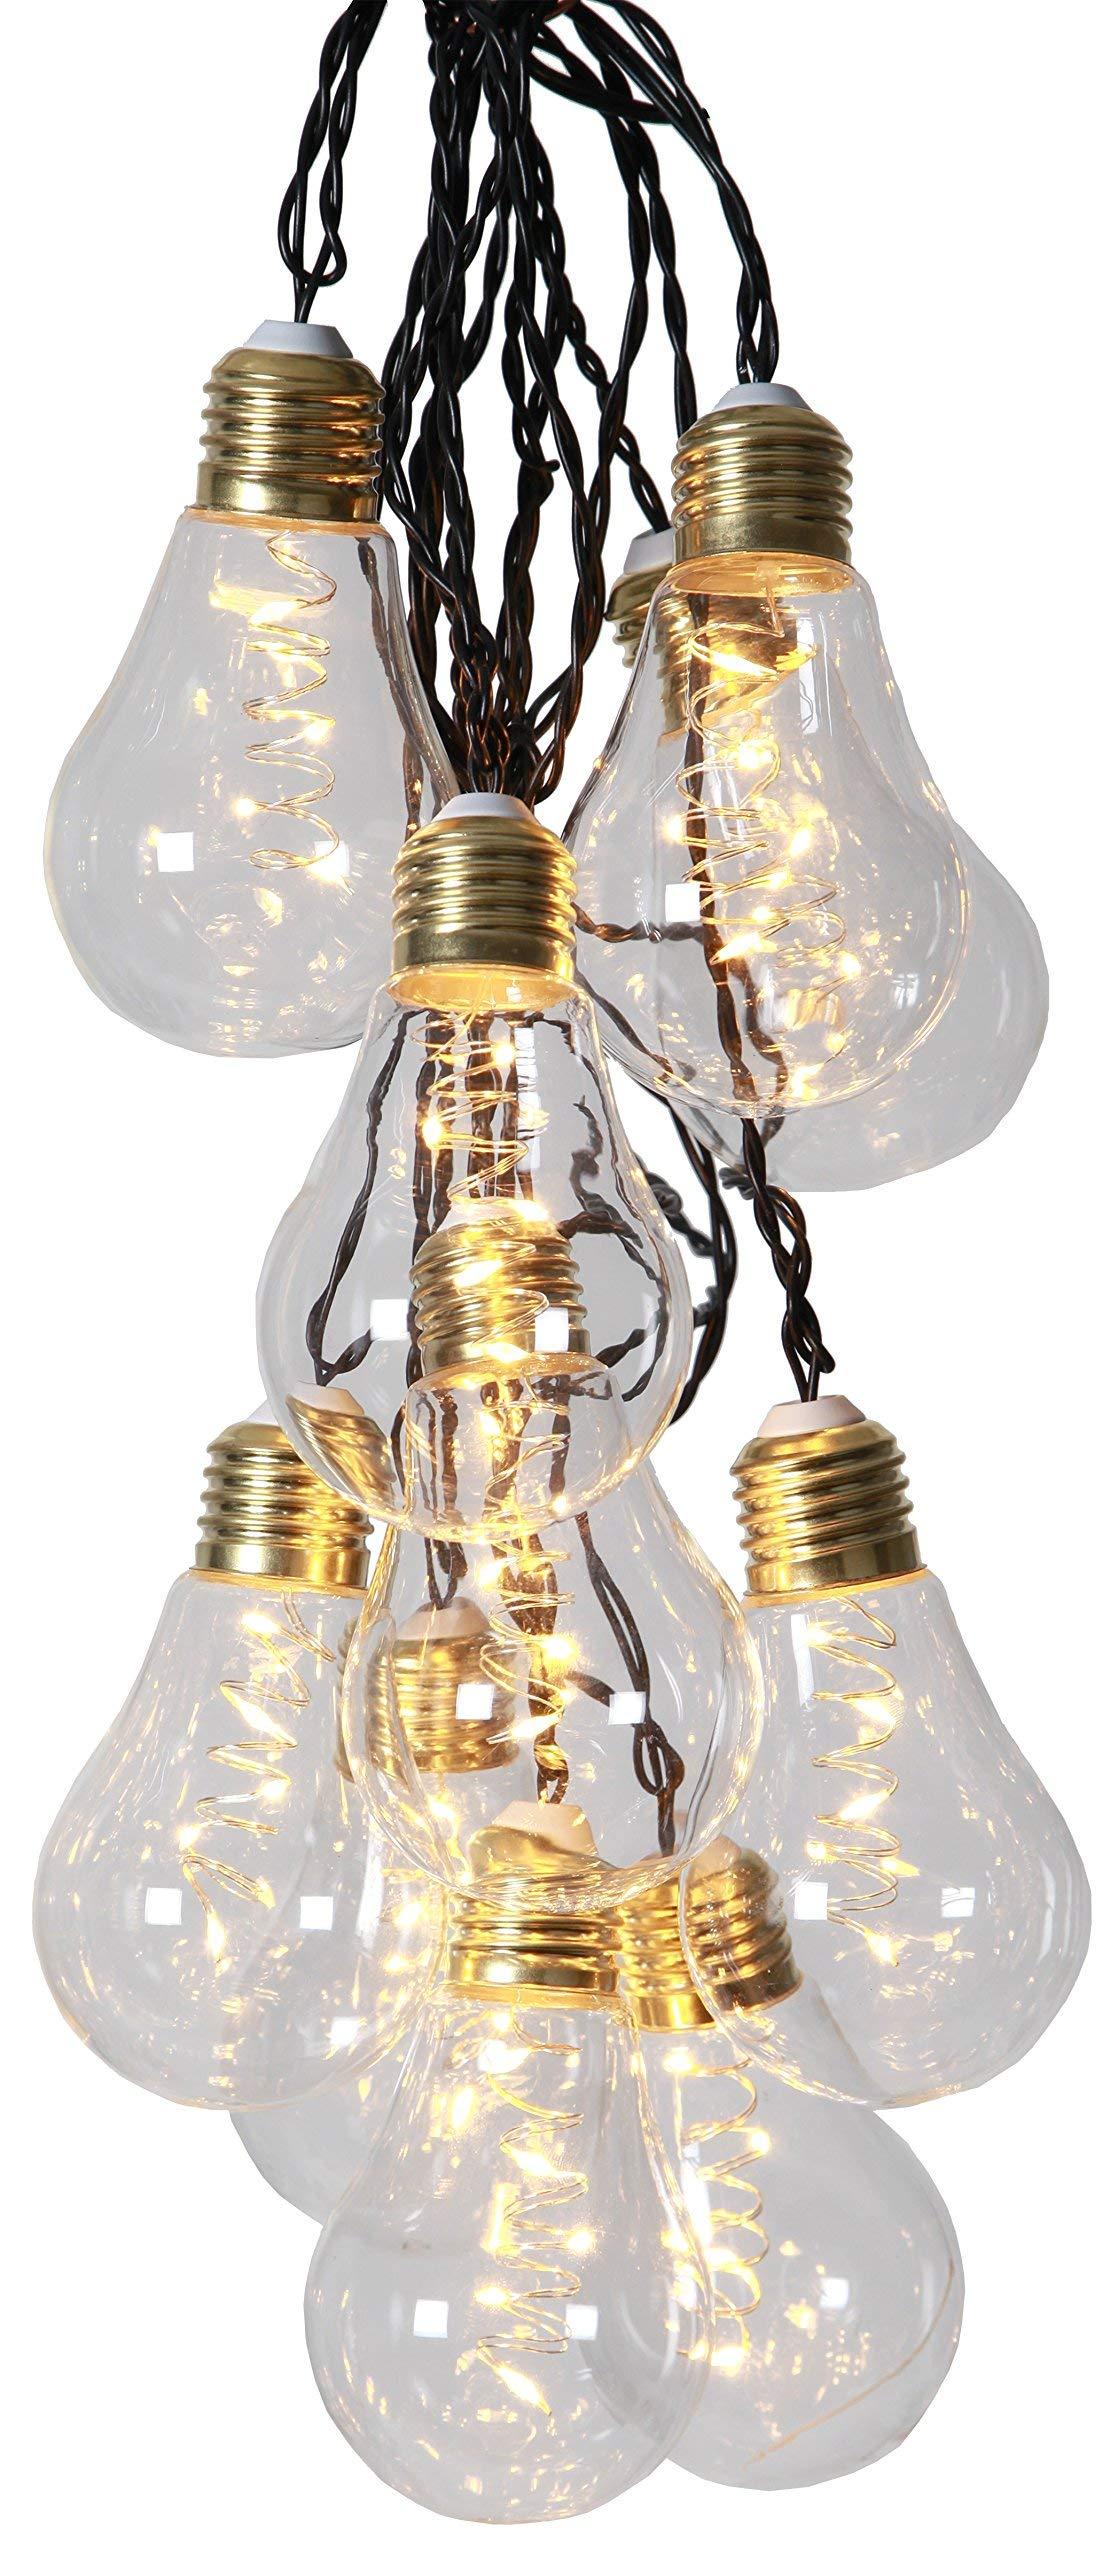 LED-Lichterkette-Glow-10teilig-Material-Glas-Kabel-schwarz-10-x-5-warm-white-LED-ca36-m